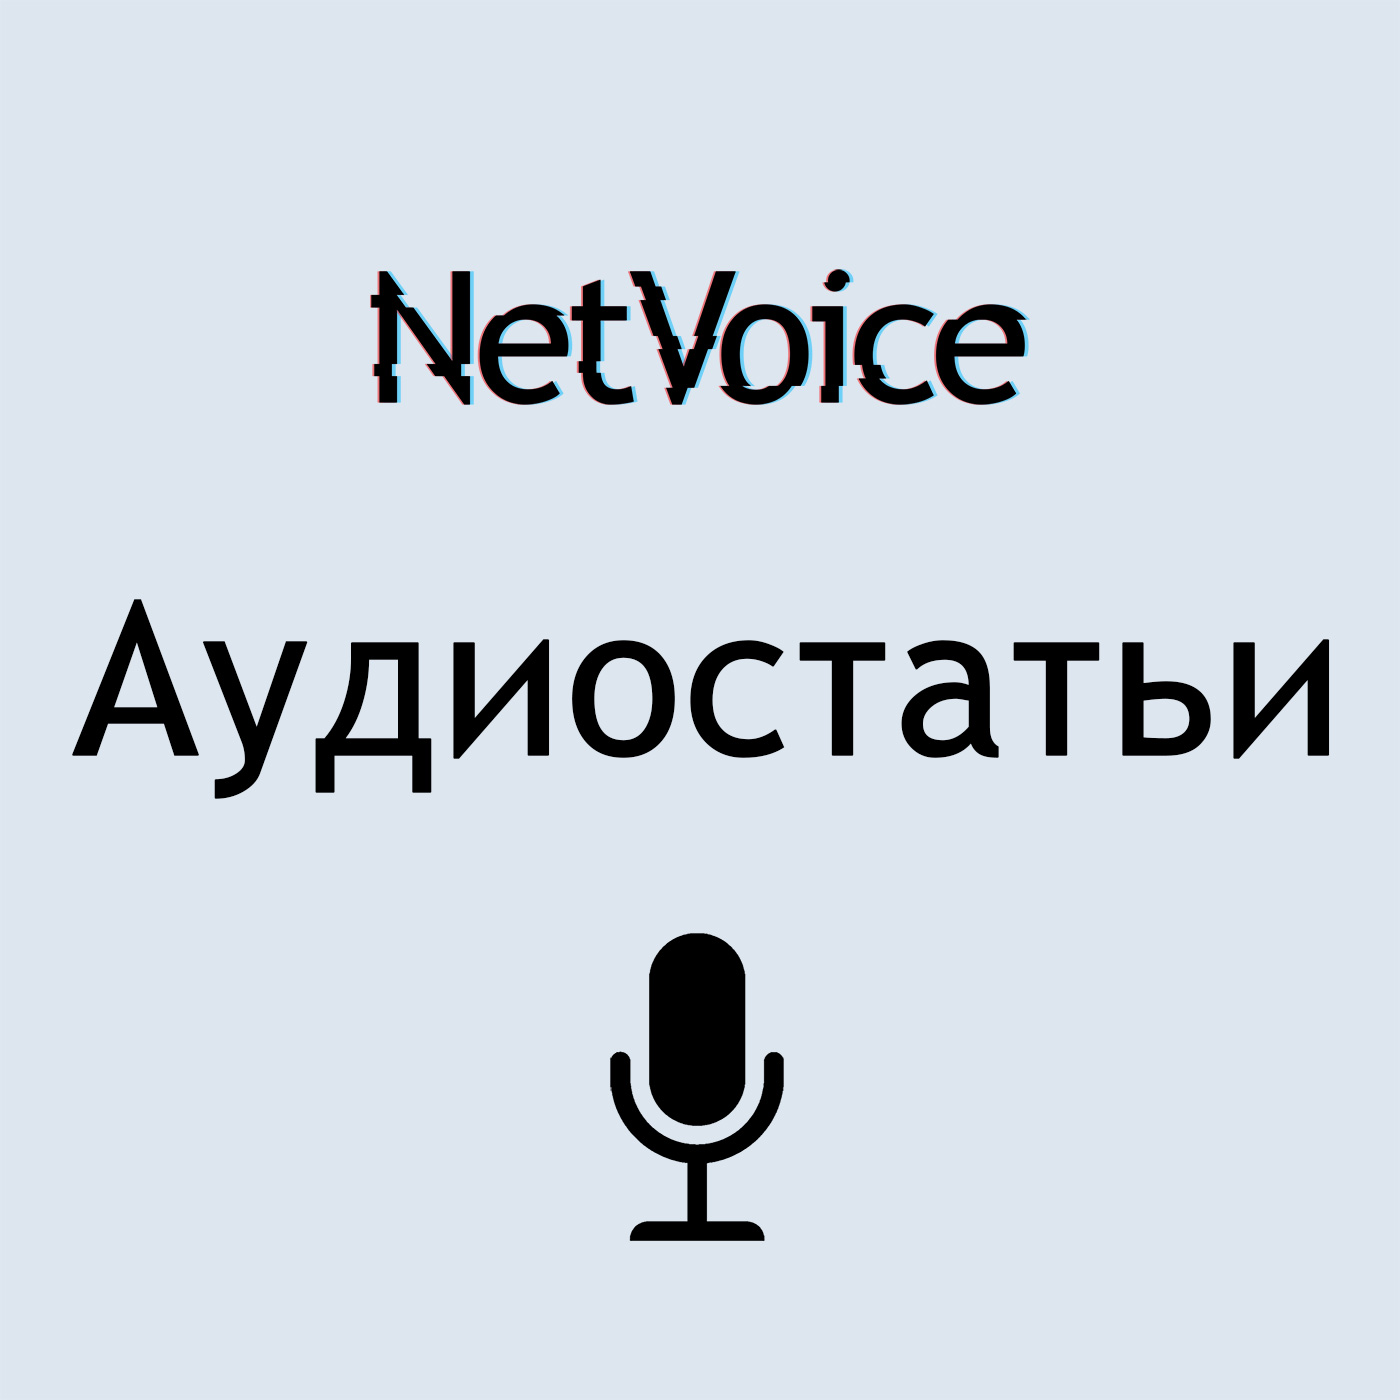 NetVoice - Аудиостатьи